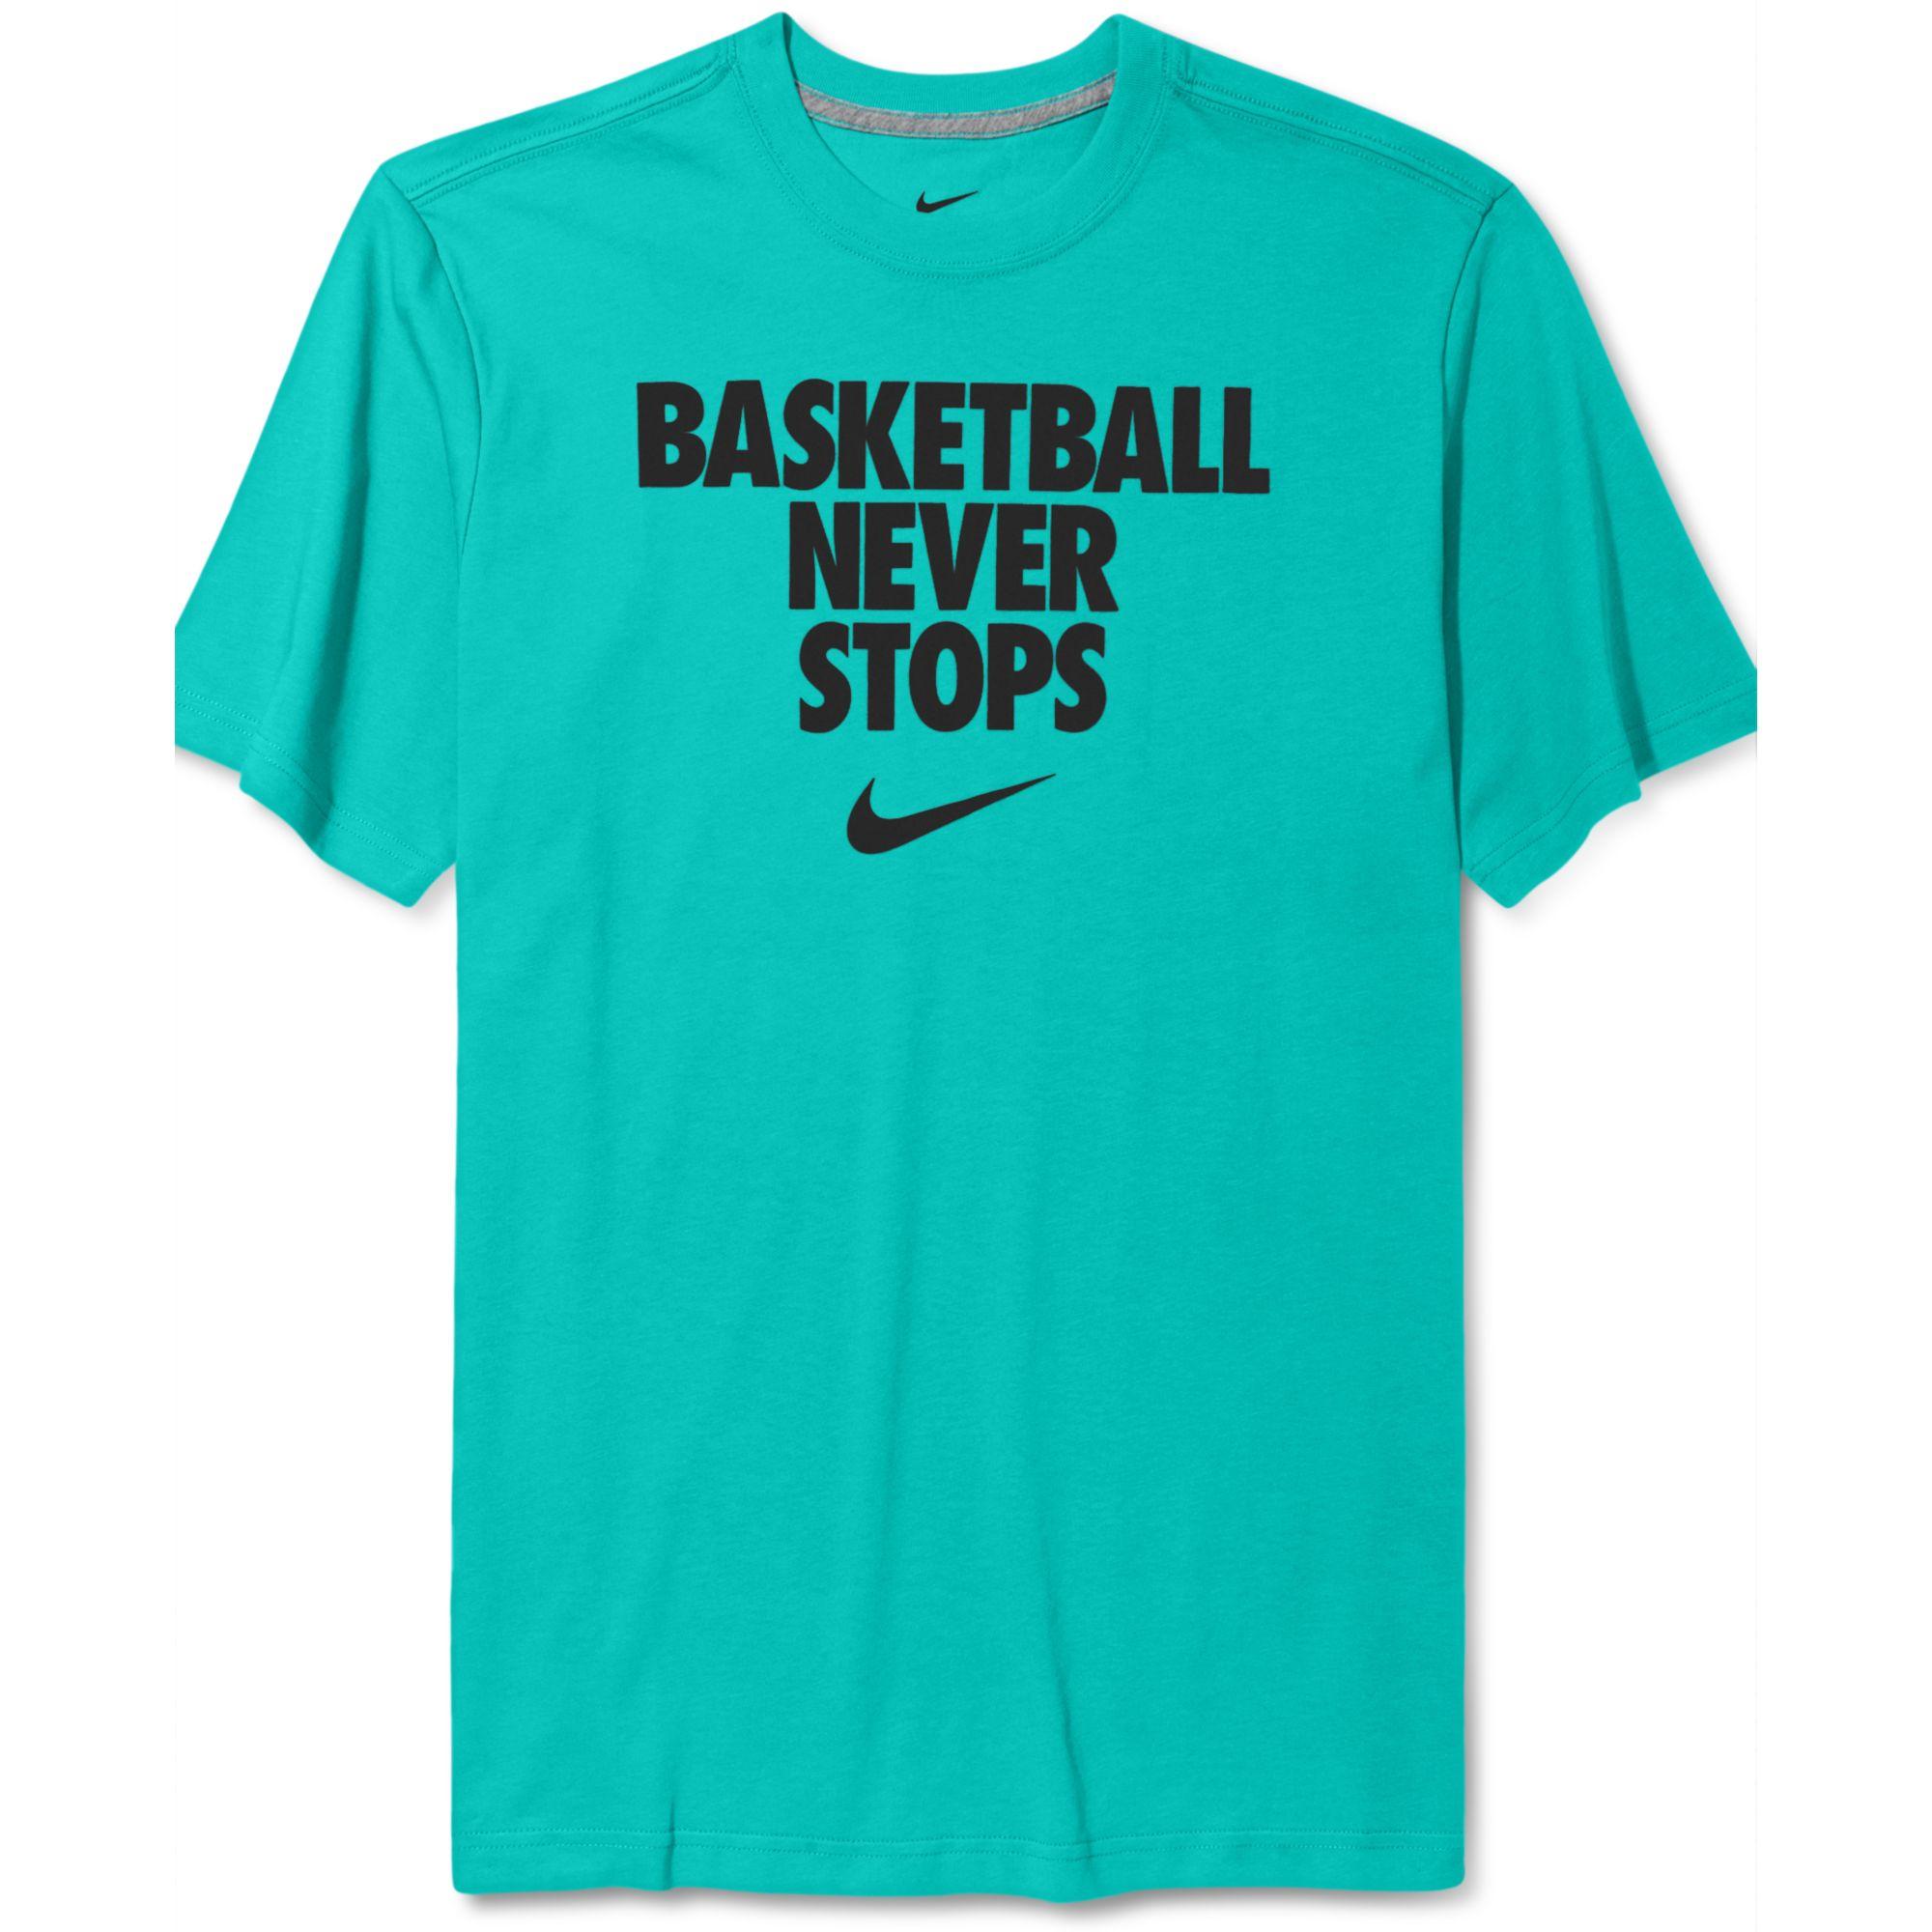 9caee090 Basketball Never Stops T Shirt Nike – EDGE Engineering and ...